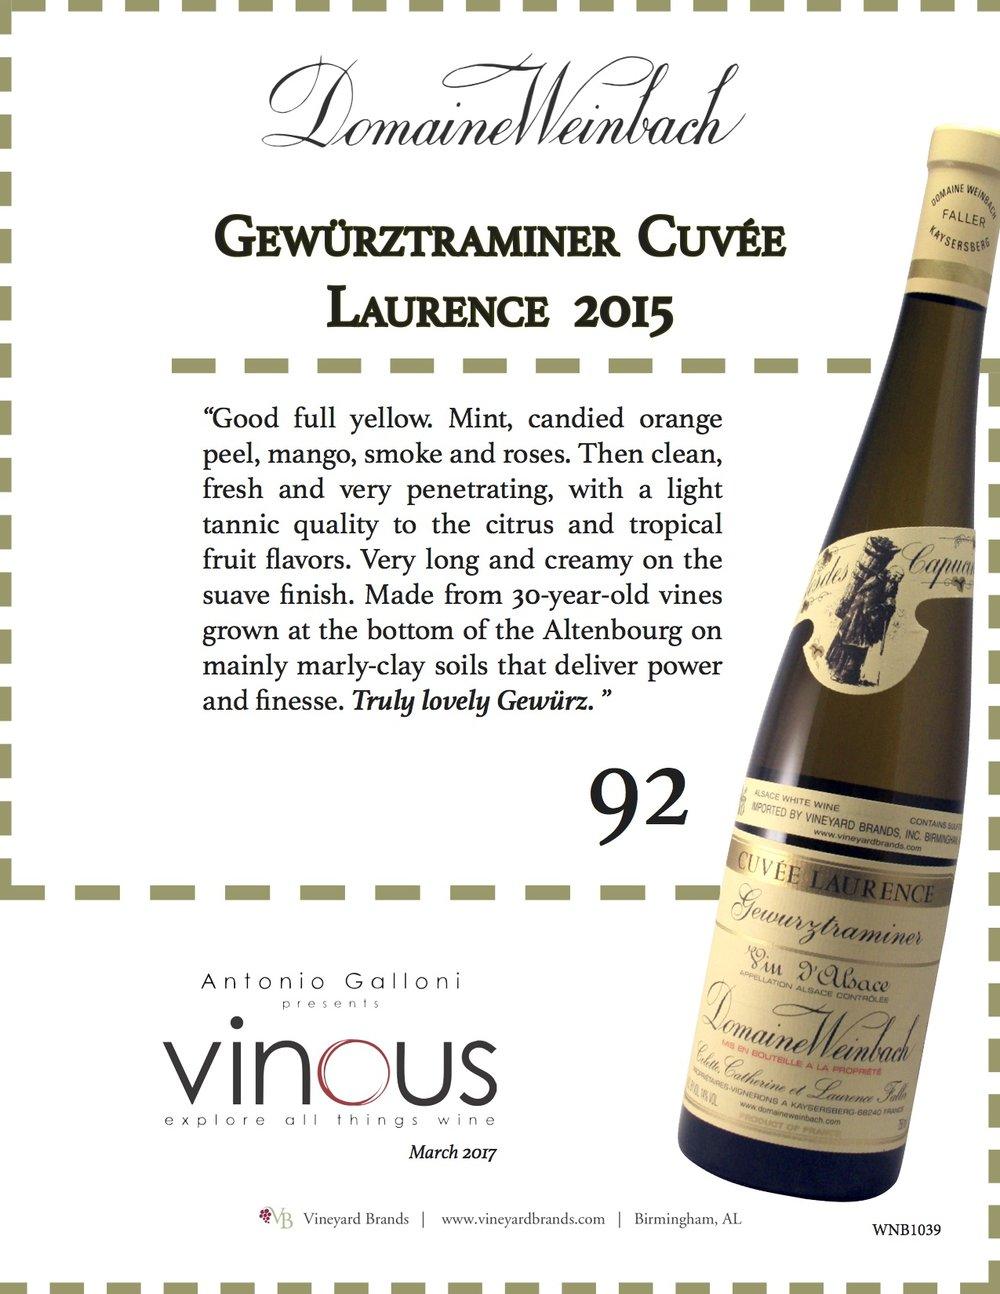 Weinbach Gewurztraminer Cuvee Laurence.jpg